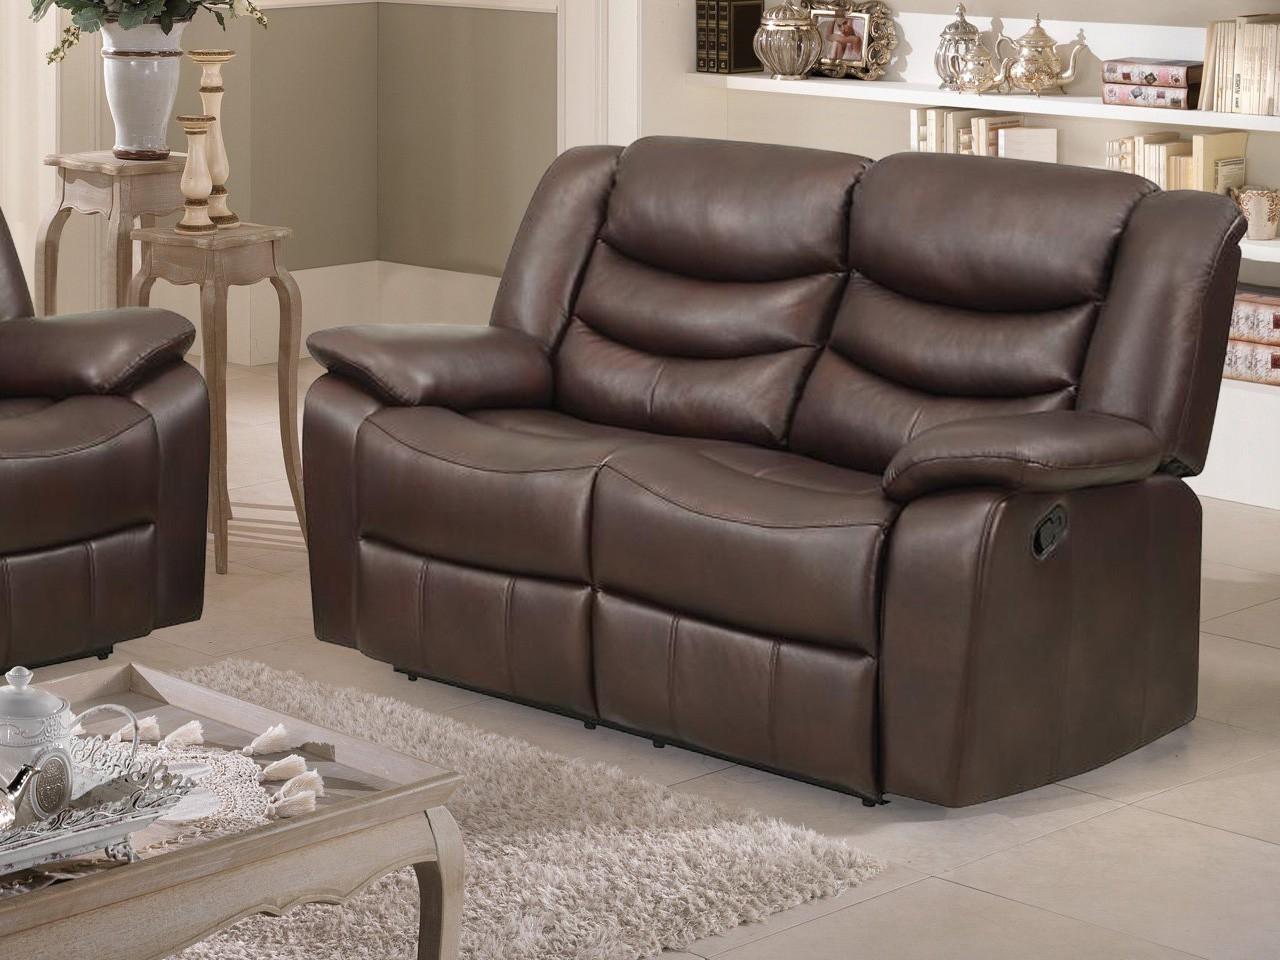 Dicoro sofas Ftd8 Fantastico Busco sofas Baratos Y Online Dicoro